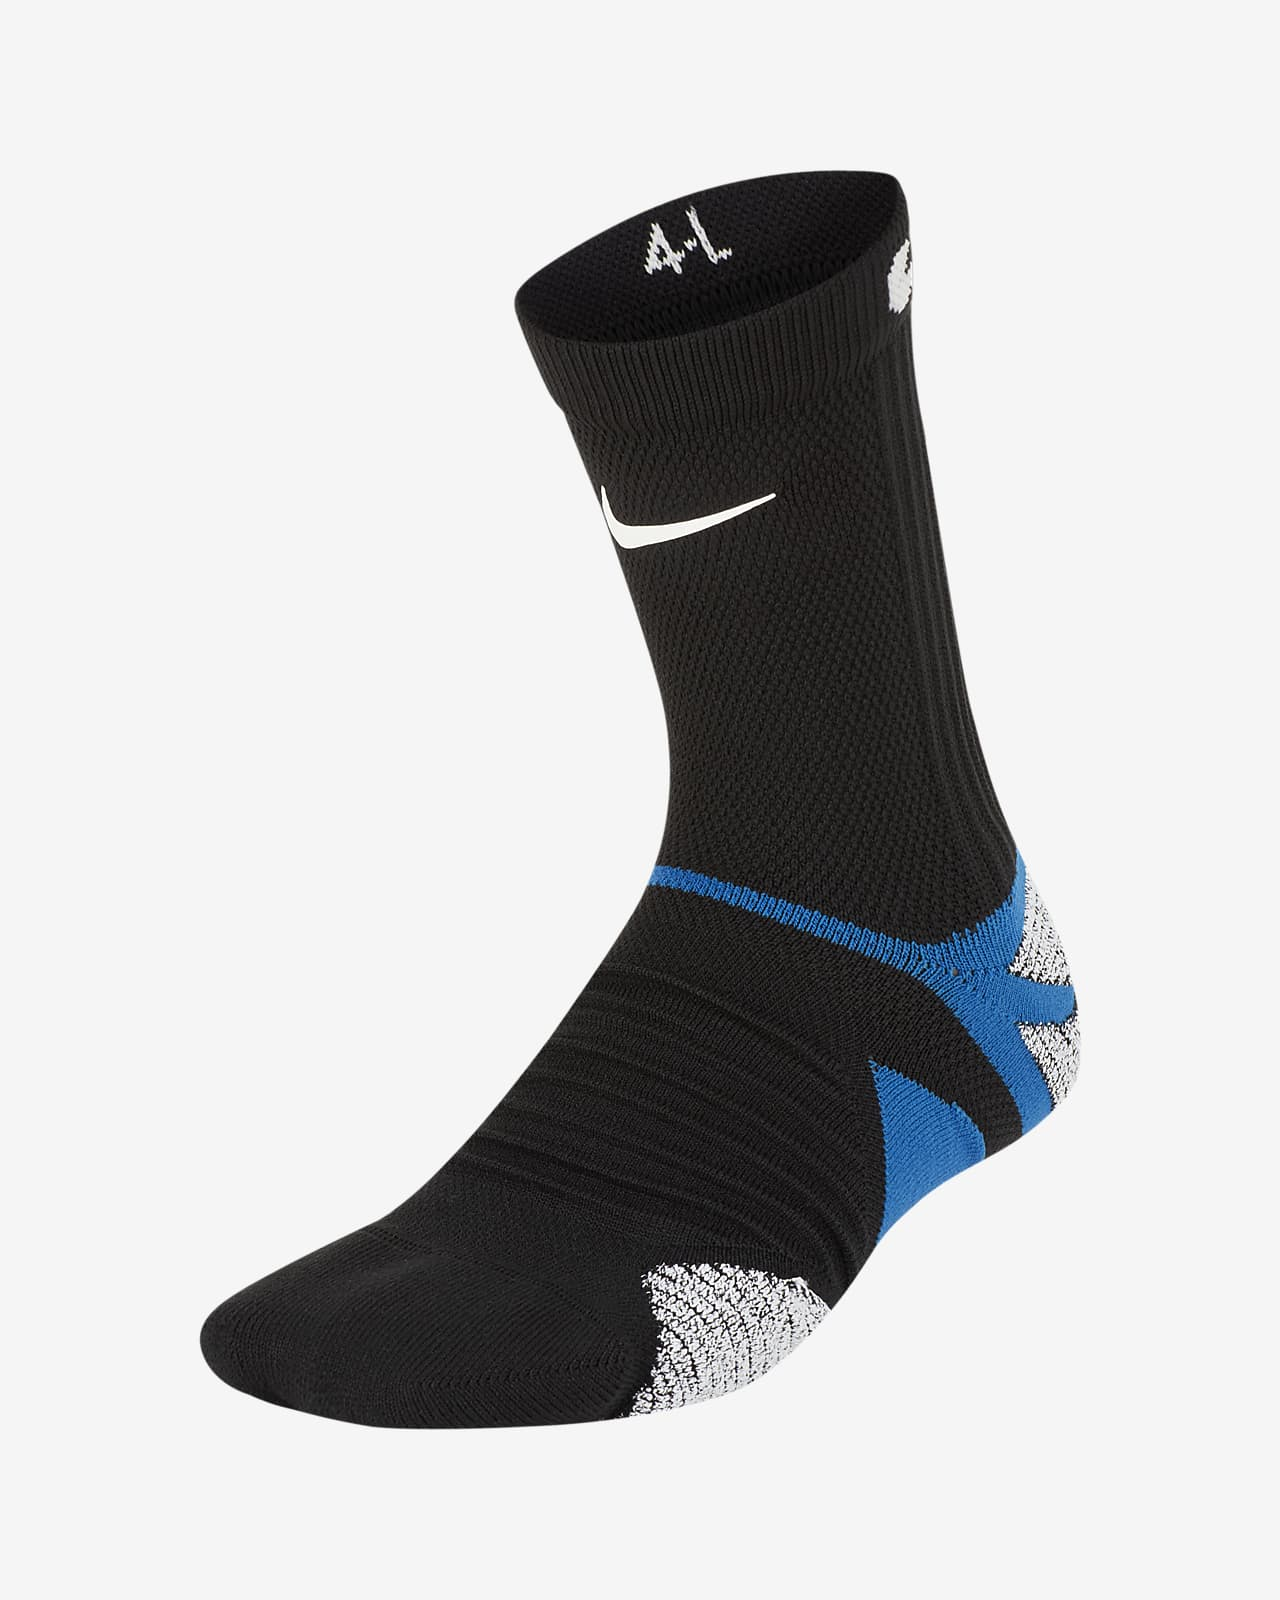 Nike x Gyakusou Ankle Racing Socks